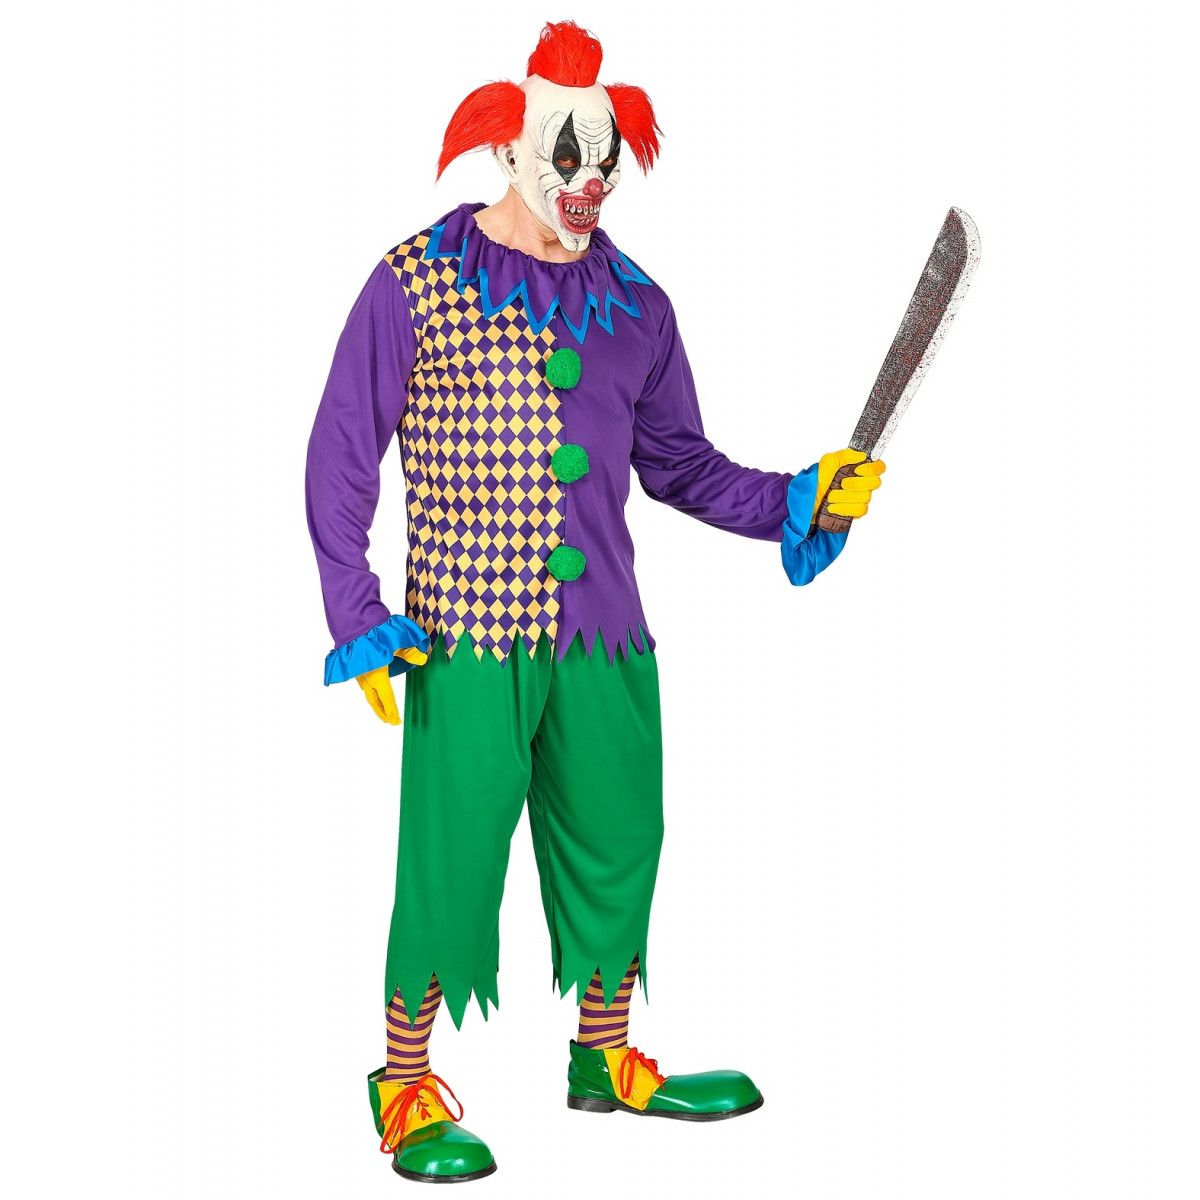 Moški pusni kostum Joker 0196